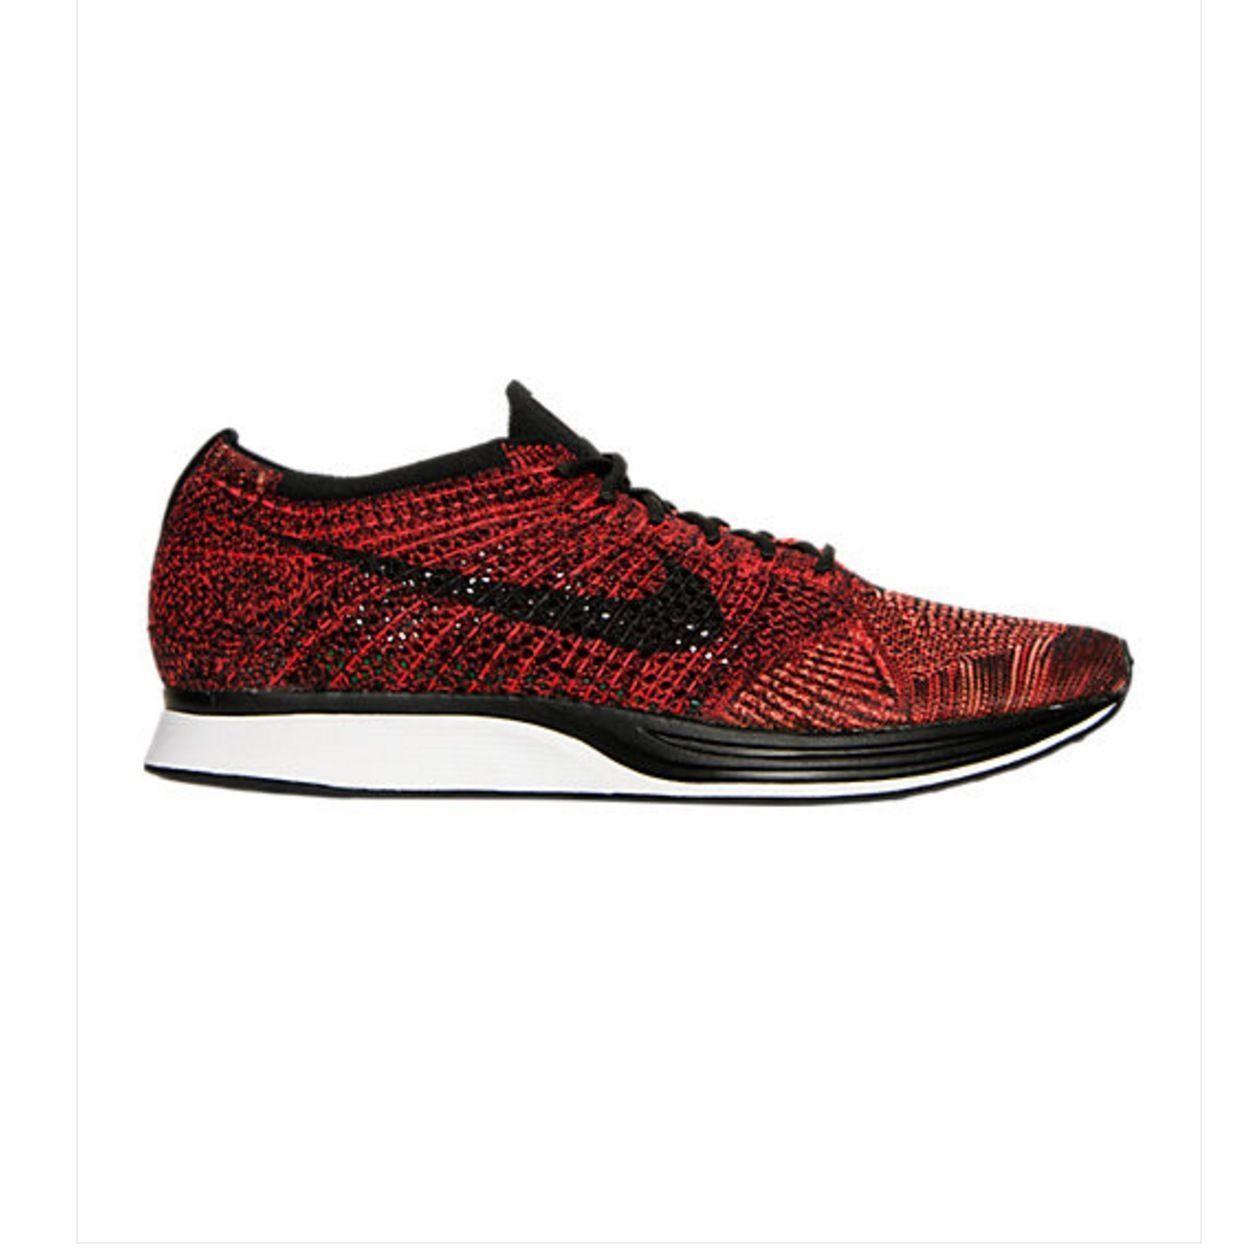 Nike Flyknit Racer Running Shoes Red Black  526628-608 US MEN SZ 7 BRAND NEW